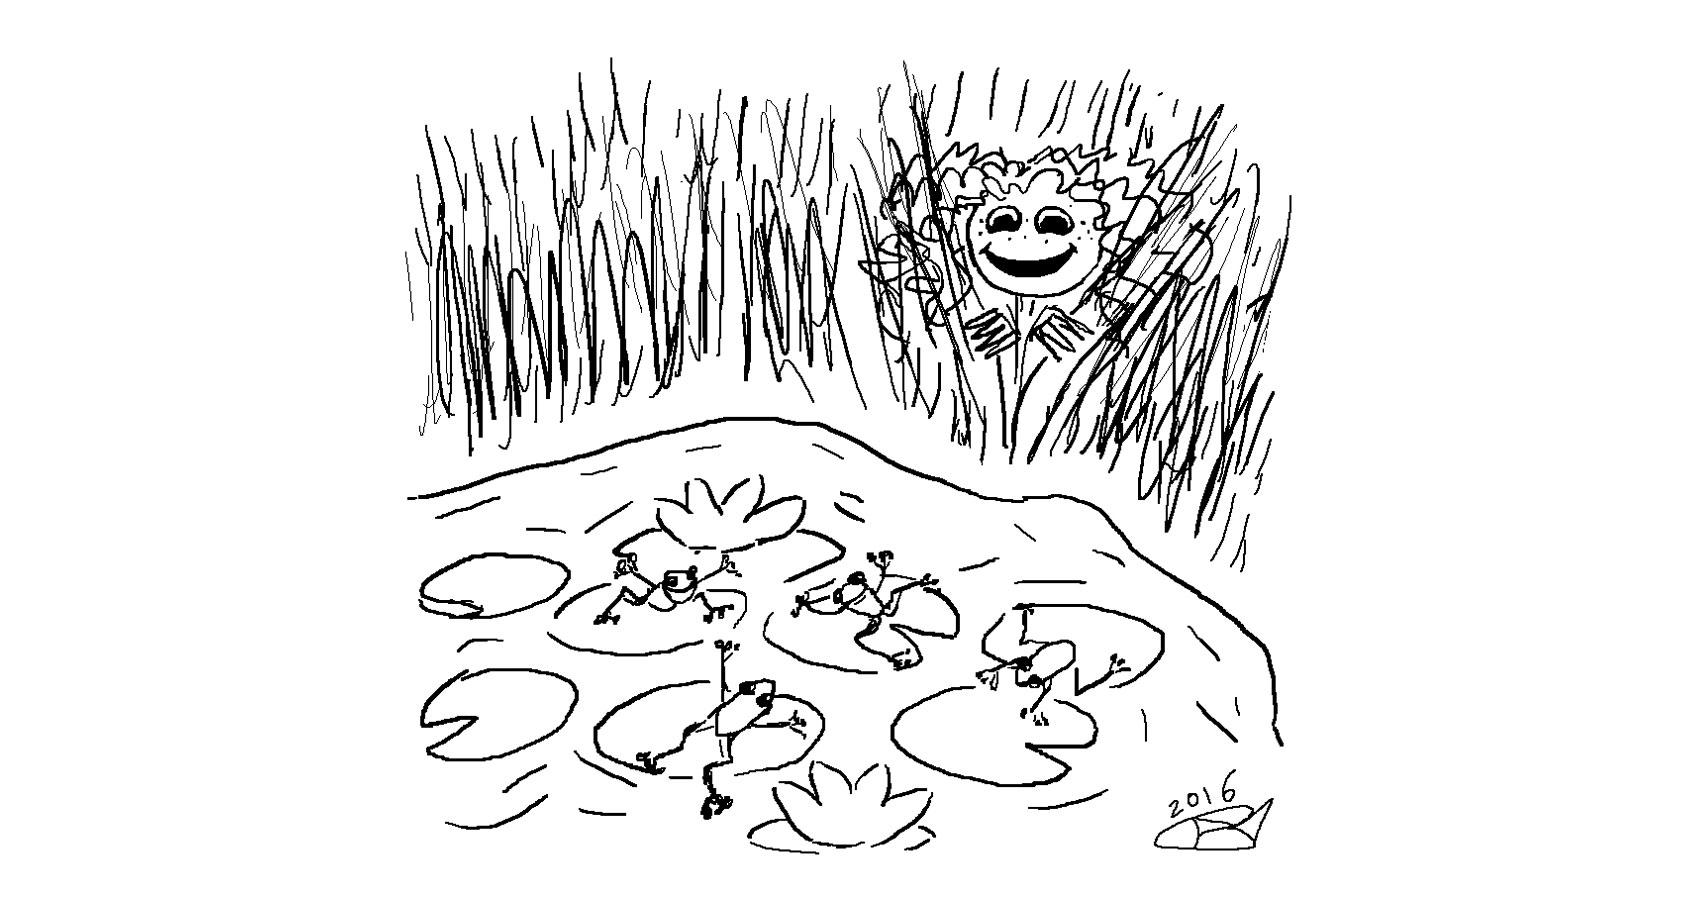 Little Froggos written by Robyn MacKinnon at Spillwords.com